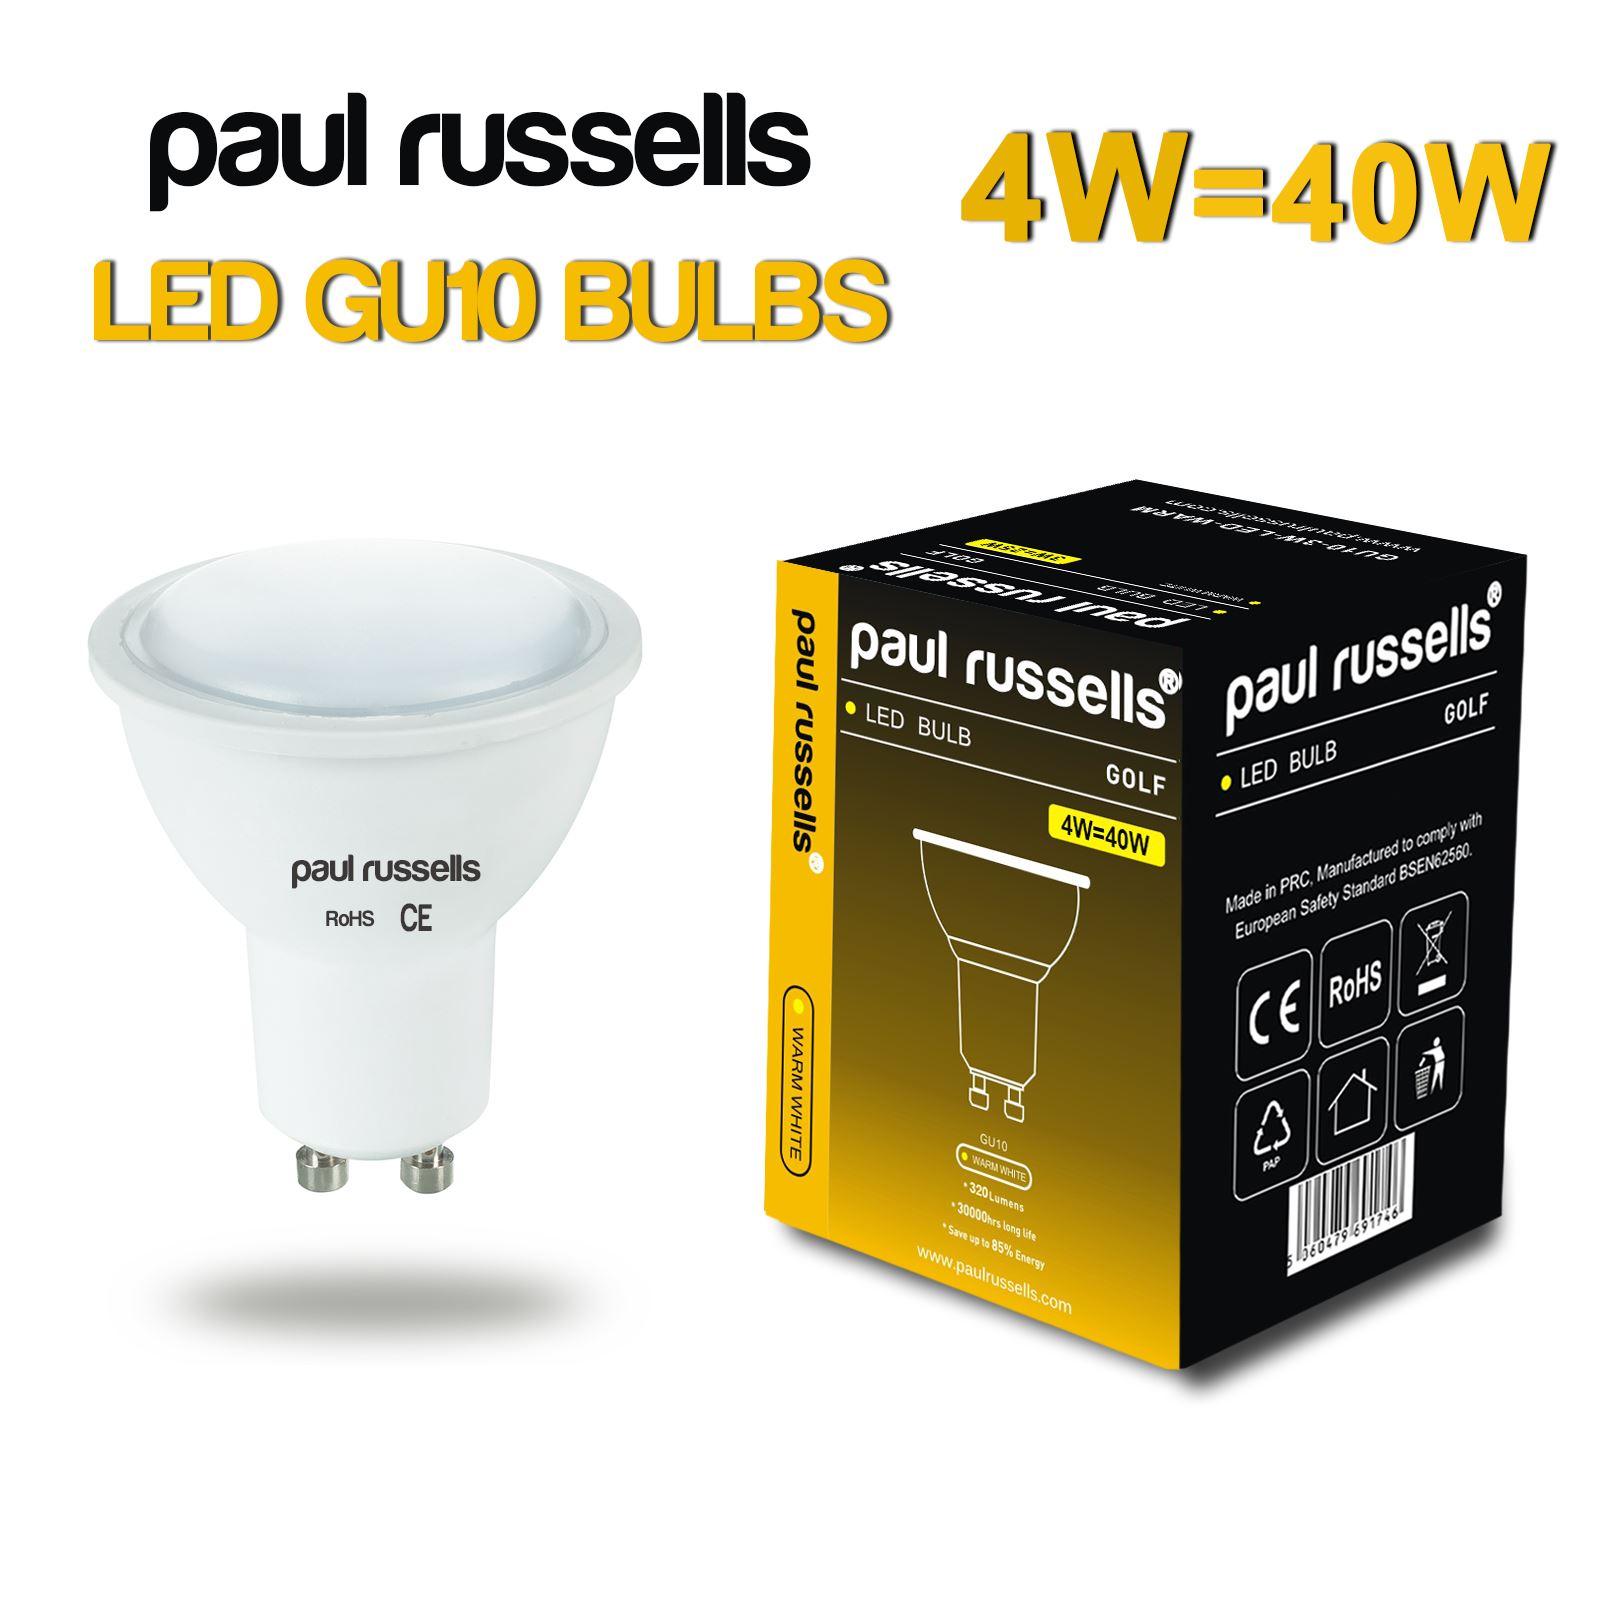 led gu10 e14 e27 b22 25w 40w 60w 100w equiv candle golf gls spot light bulbs. Black Bedroom Furniture Sets. Home Design Ideas